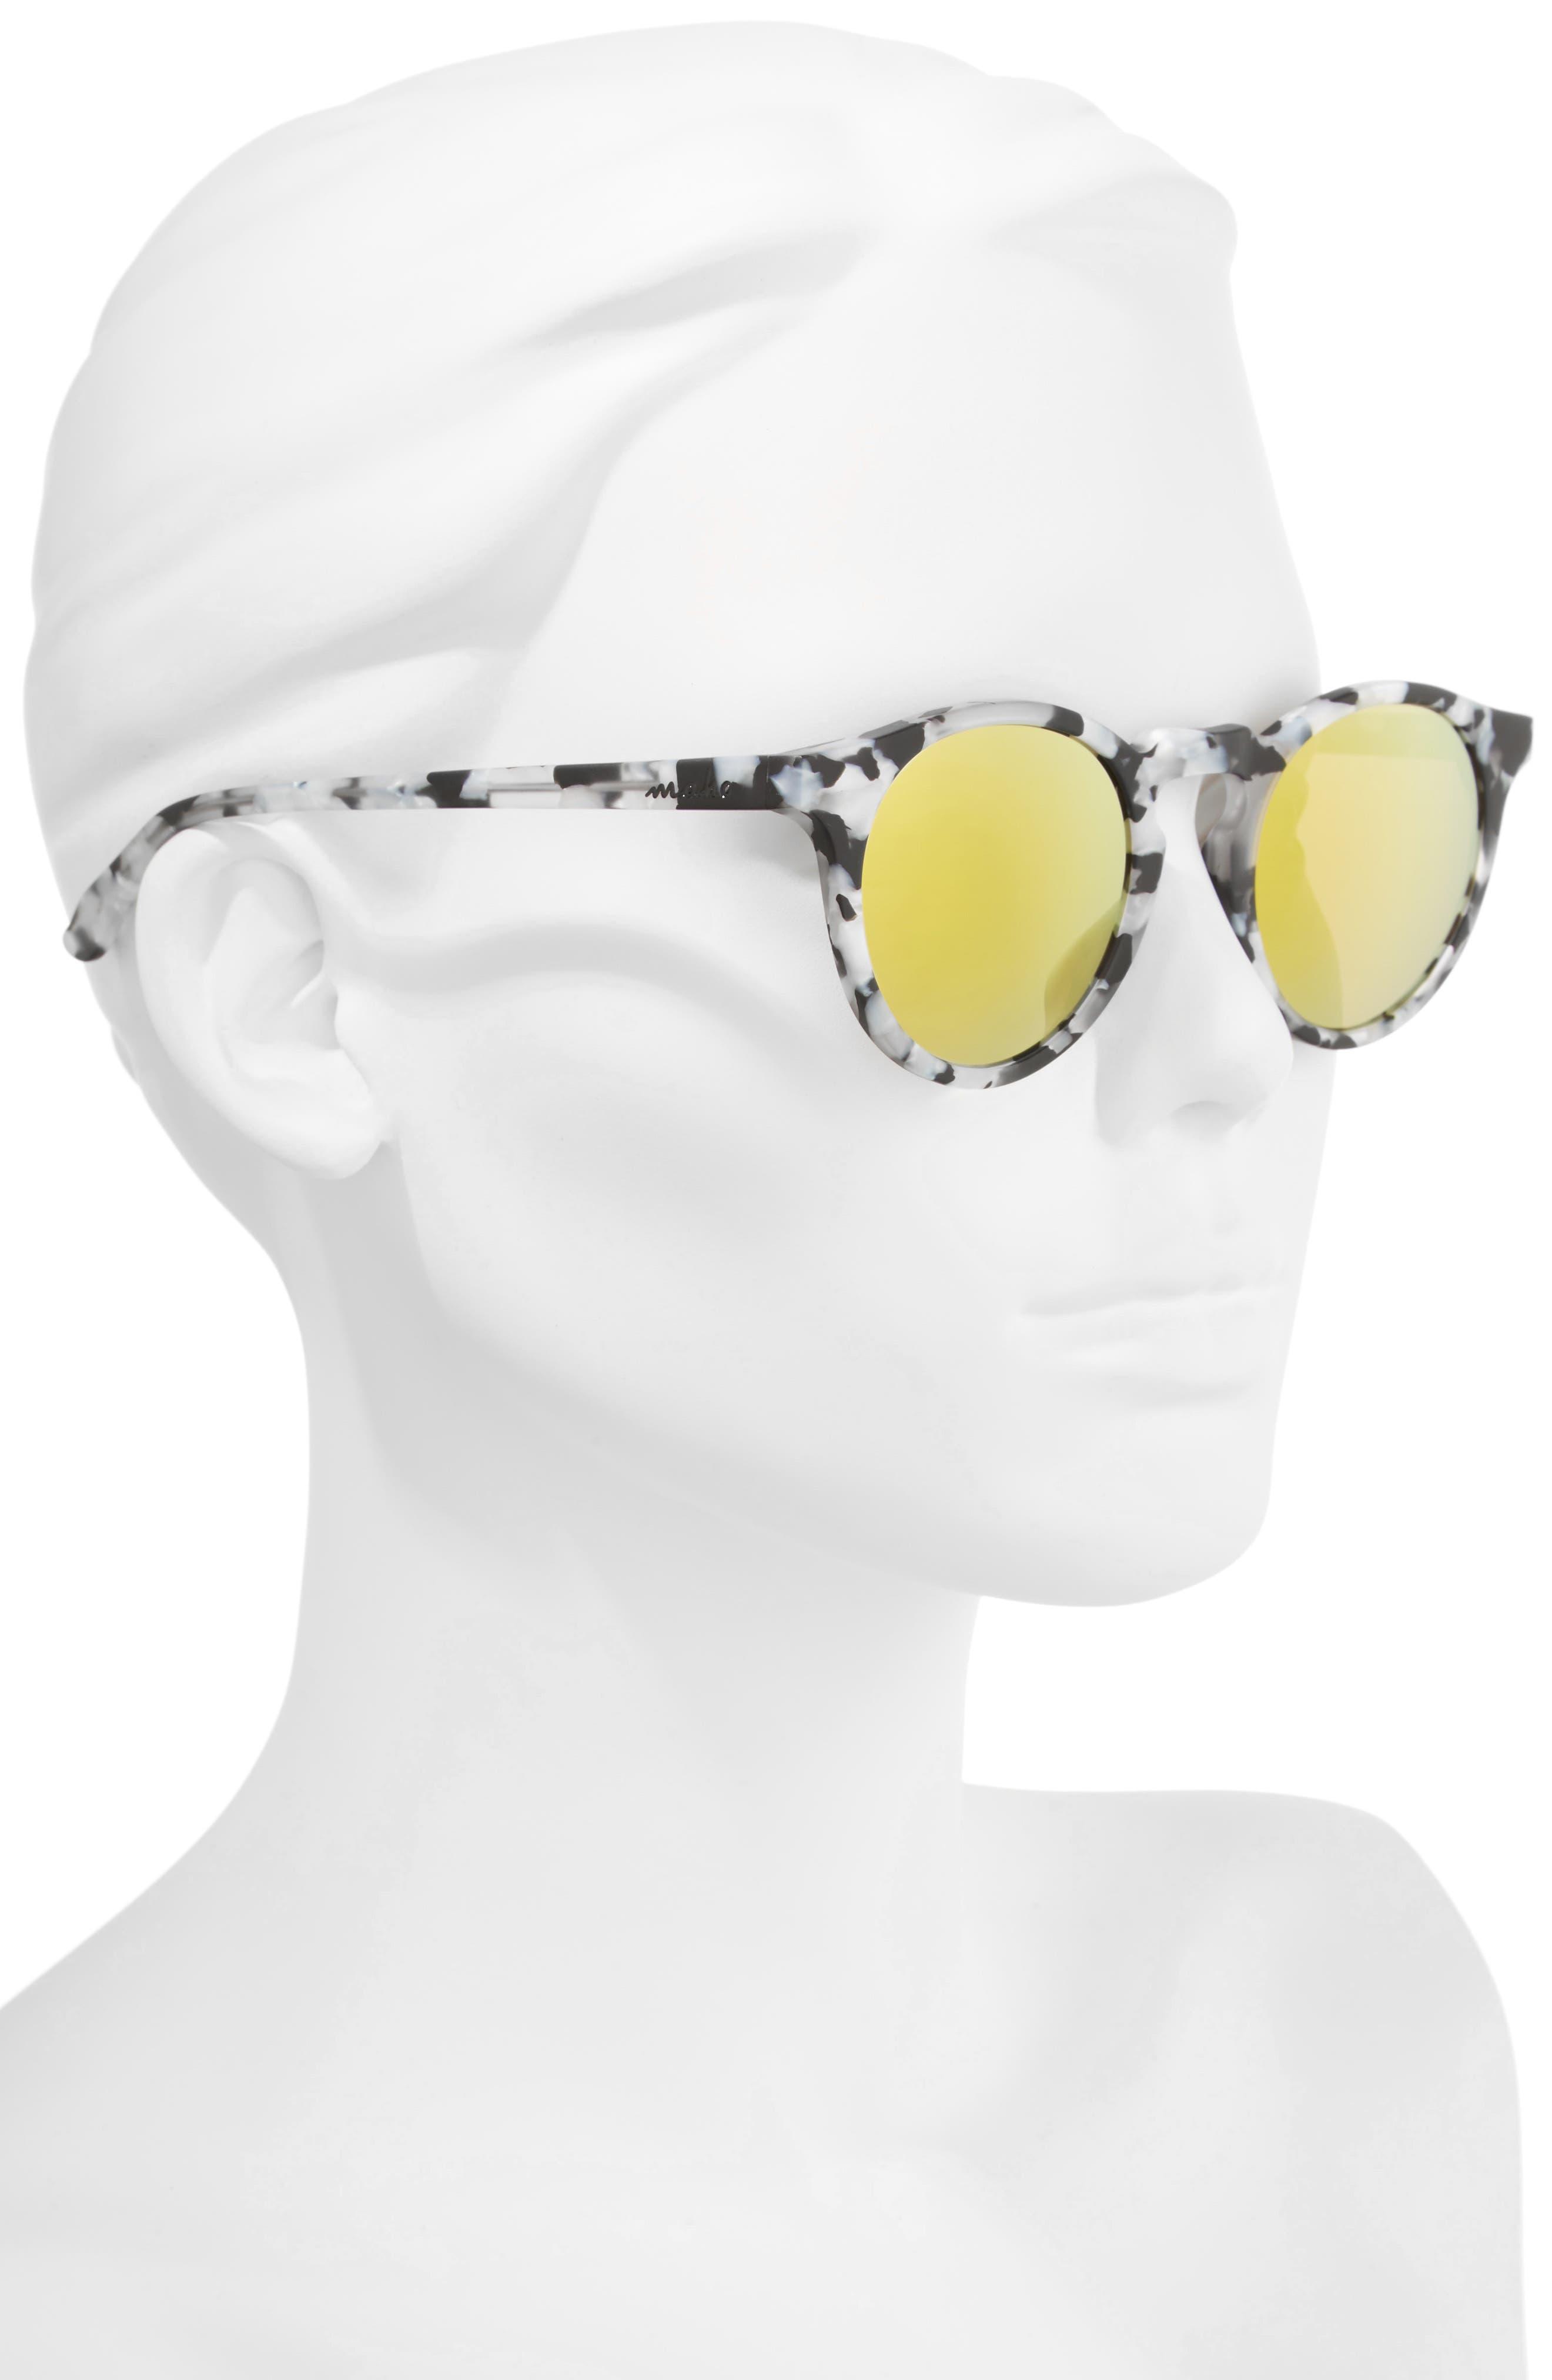 Stockholm 48mm Polarized Round Sunglasses,                             Alternate thumbnail 2, color,                             001